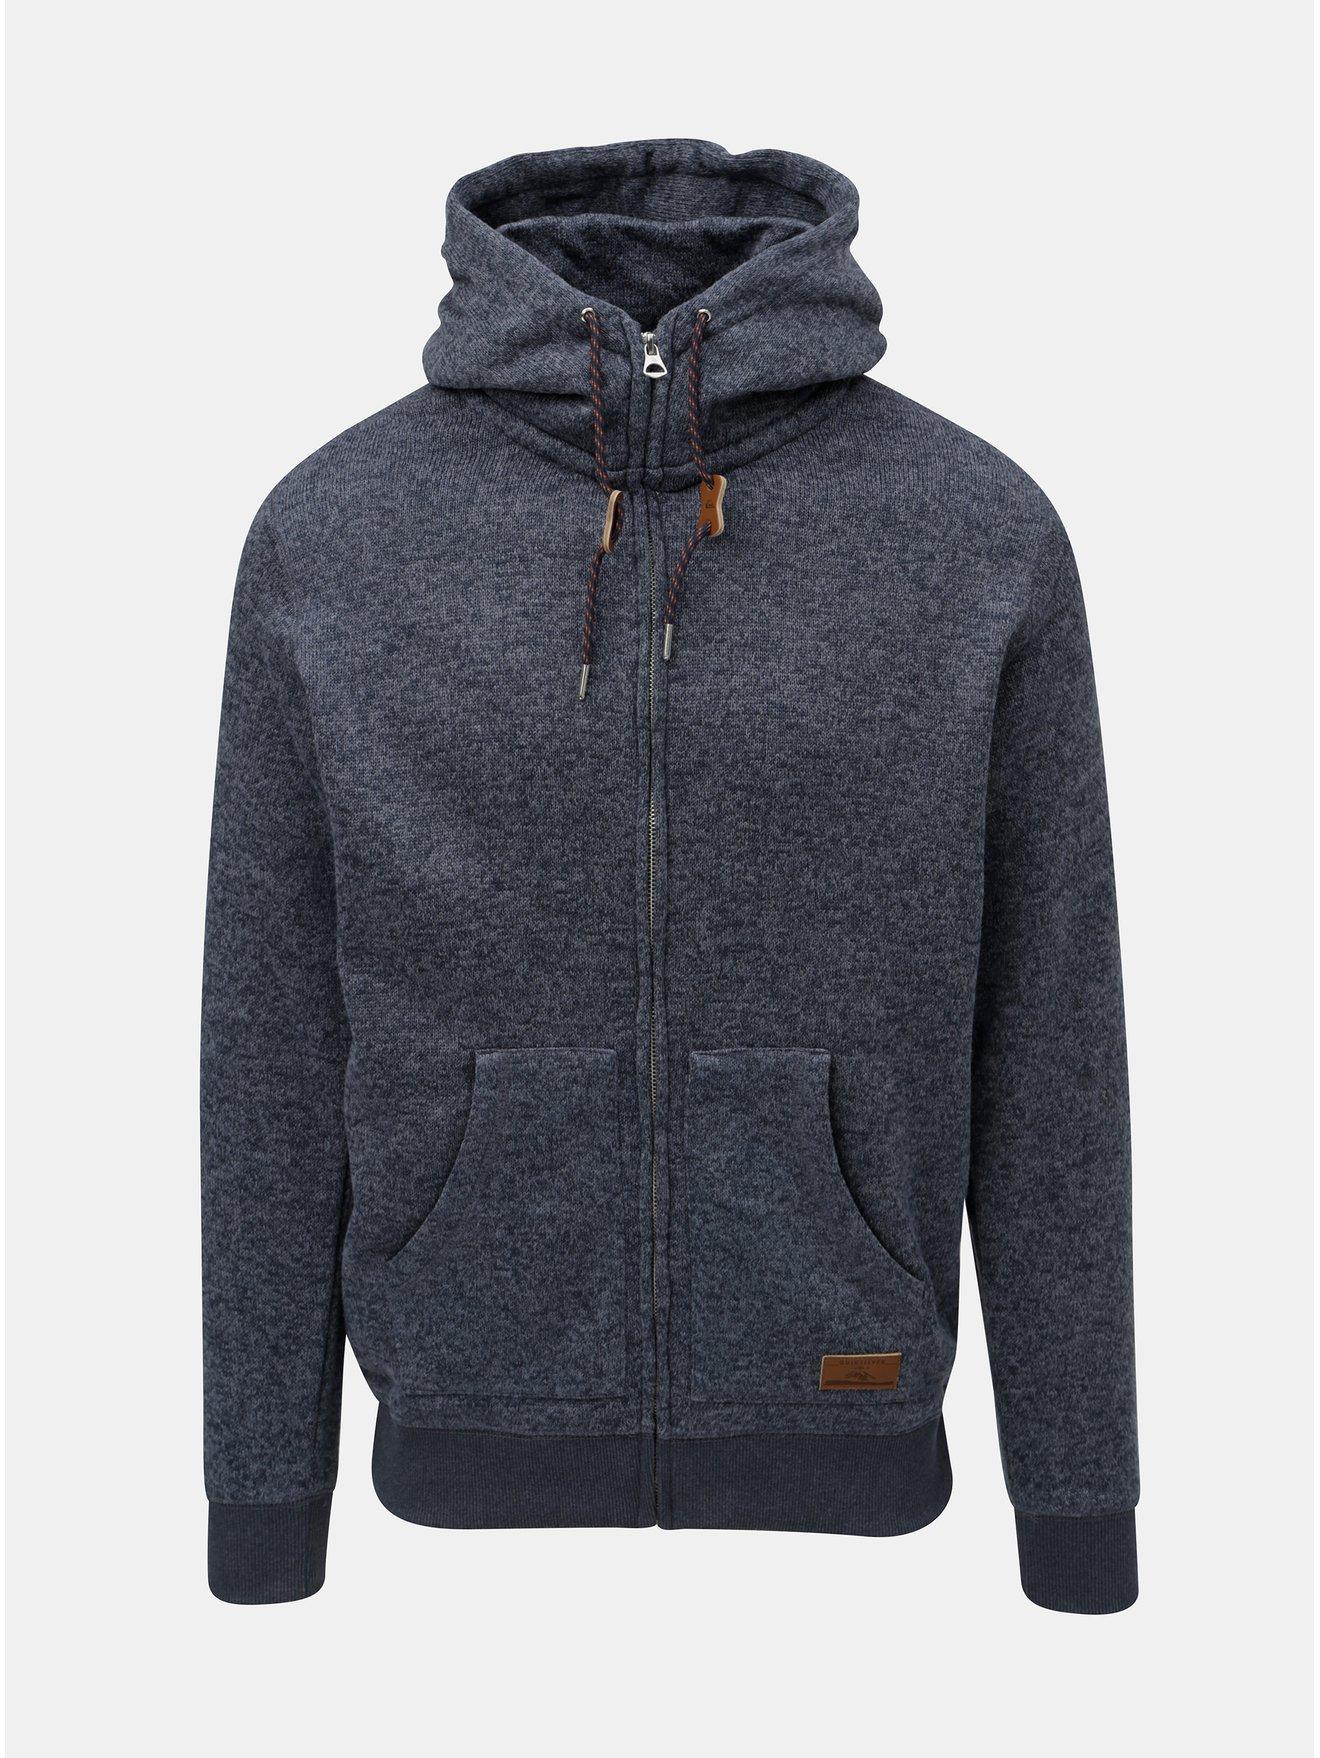 Modrý pánský žíhaný svetr s kapucí na zip Quiksilver Keller